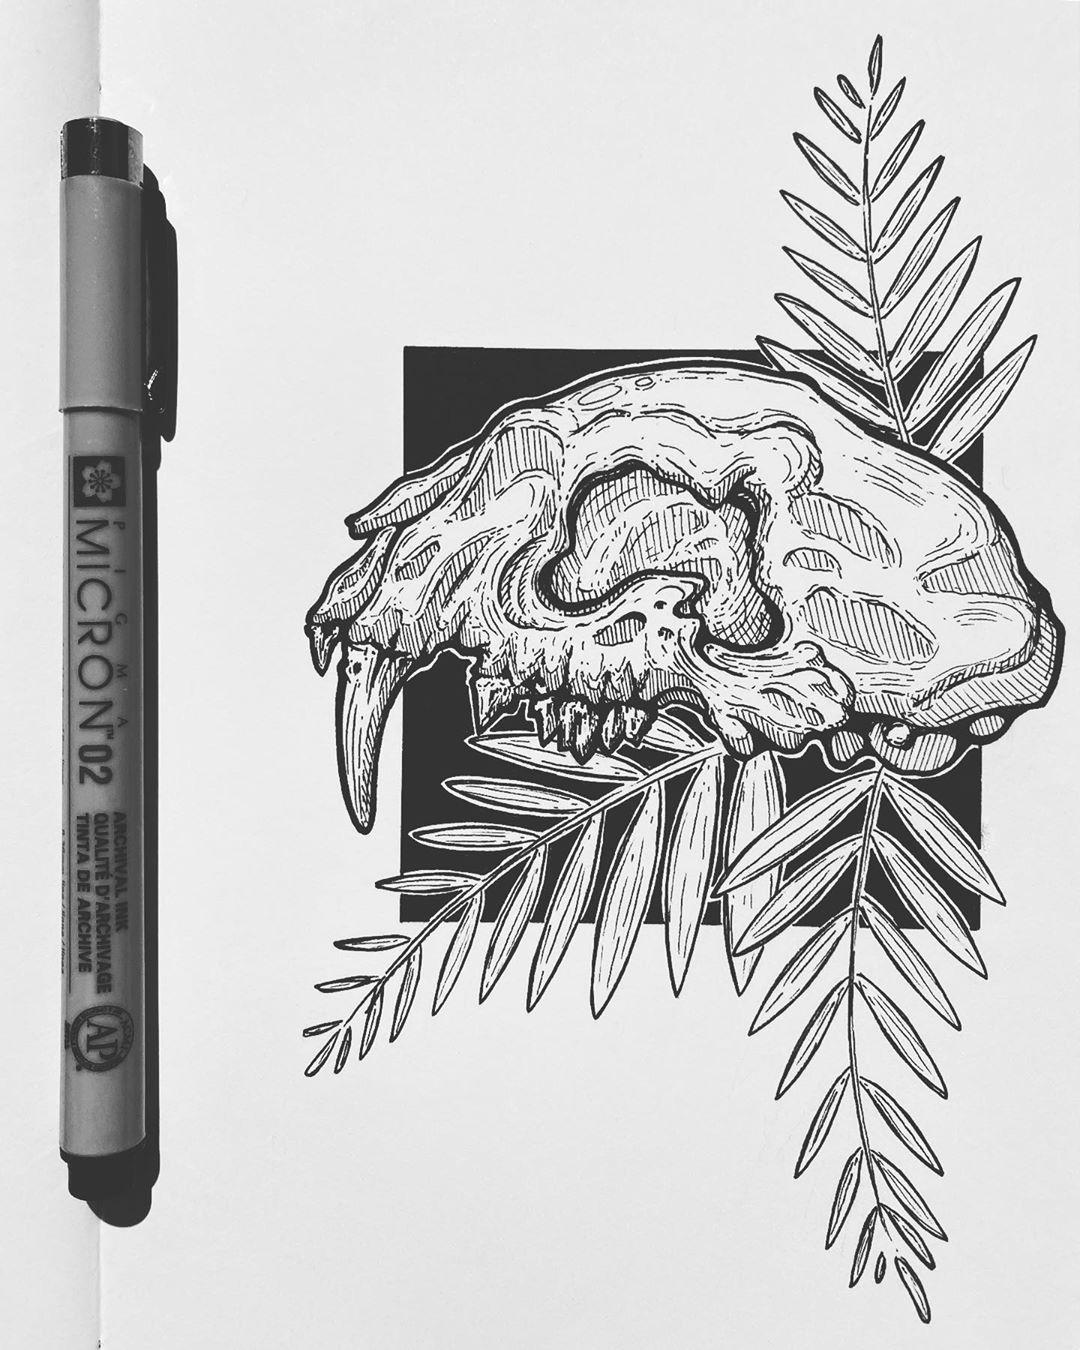 Inspired by a Lynx skull which have some huge eye sockets! . . . . . . . . . . . #moleskine #pigma #pigmamicron #sakuraofamerica #sketchbook #moleskinesketch #micronpen #artdaily #inking #blackworks #illustration #sketching #linework #crosshatching #inktime #inkwork #micron #dailydraw #draw #artistsofinstagram #staedtler #moleskinesketchbook #linework #sketch #inkpage #blackwork #artoftheday #inkart #ink #blackworker